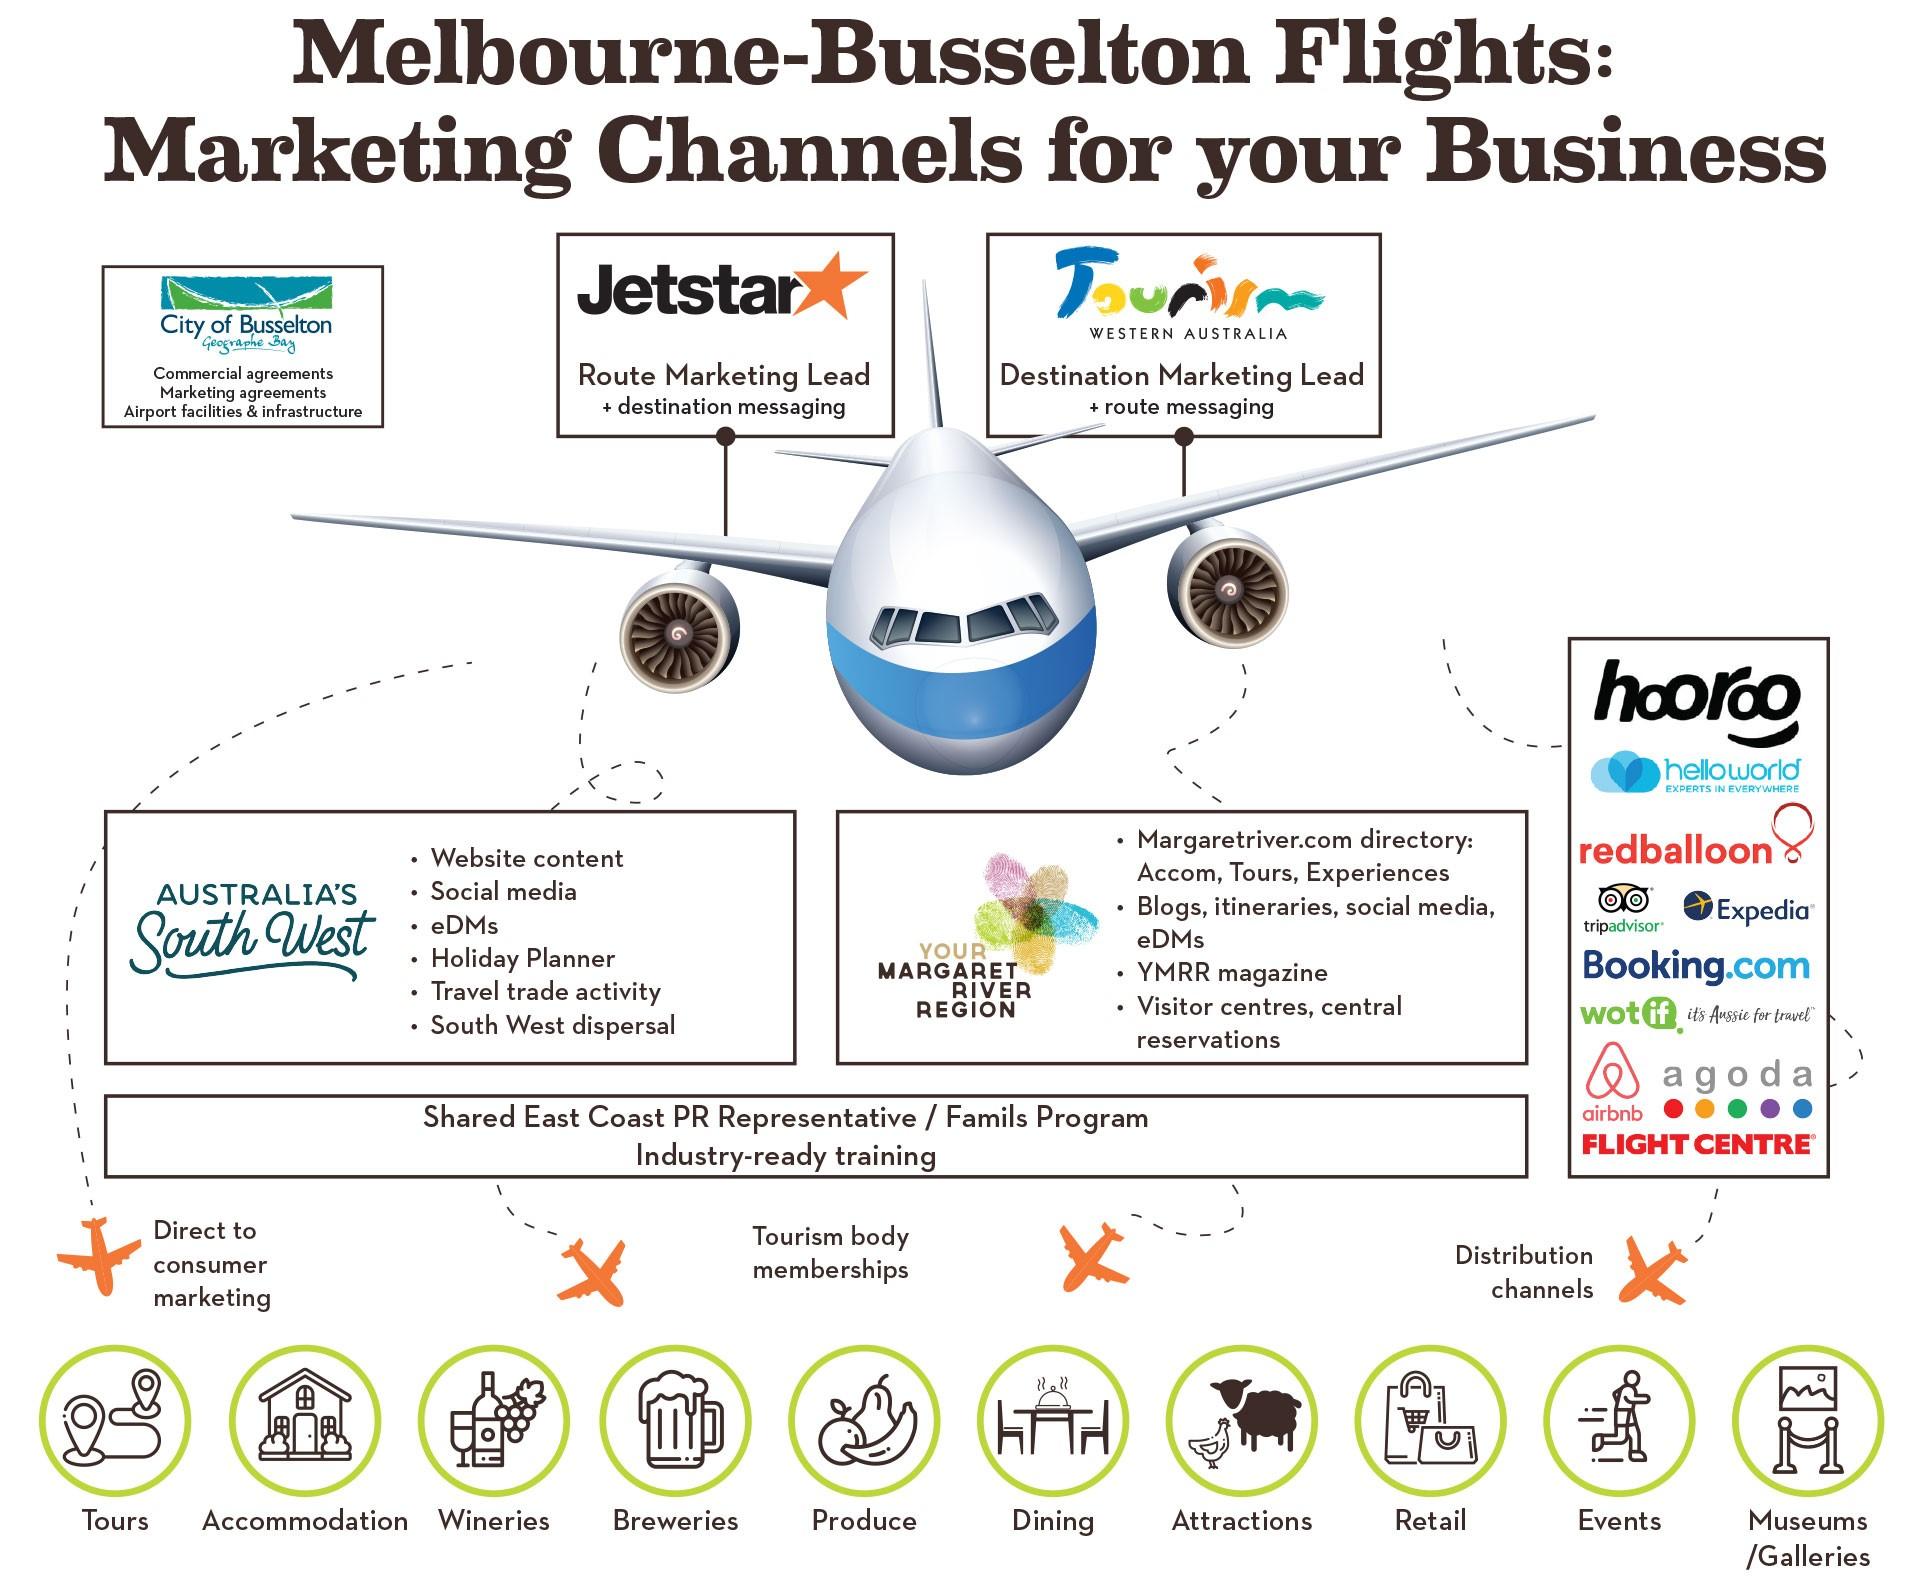 Jetstar Route Marketing Update